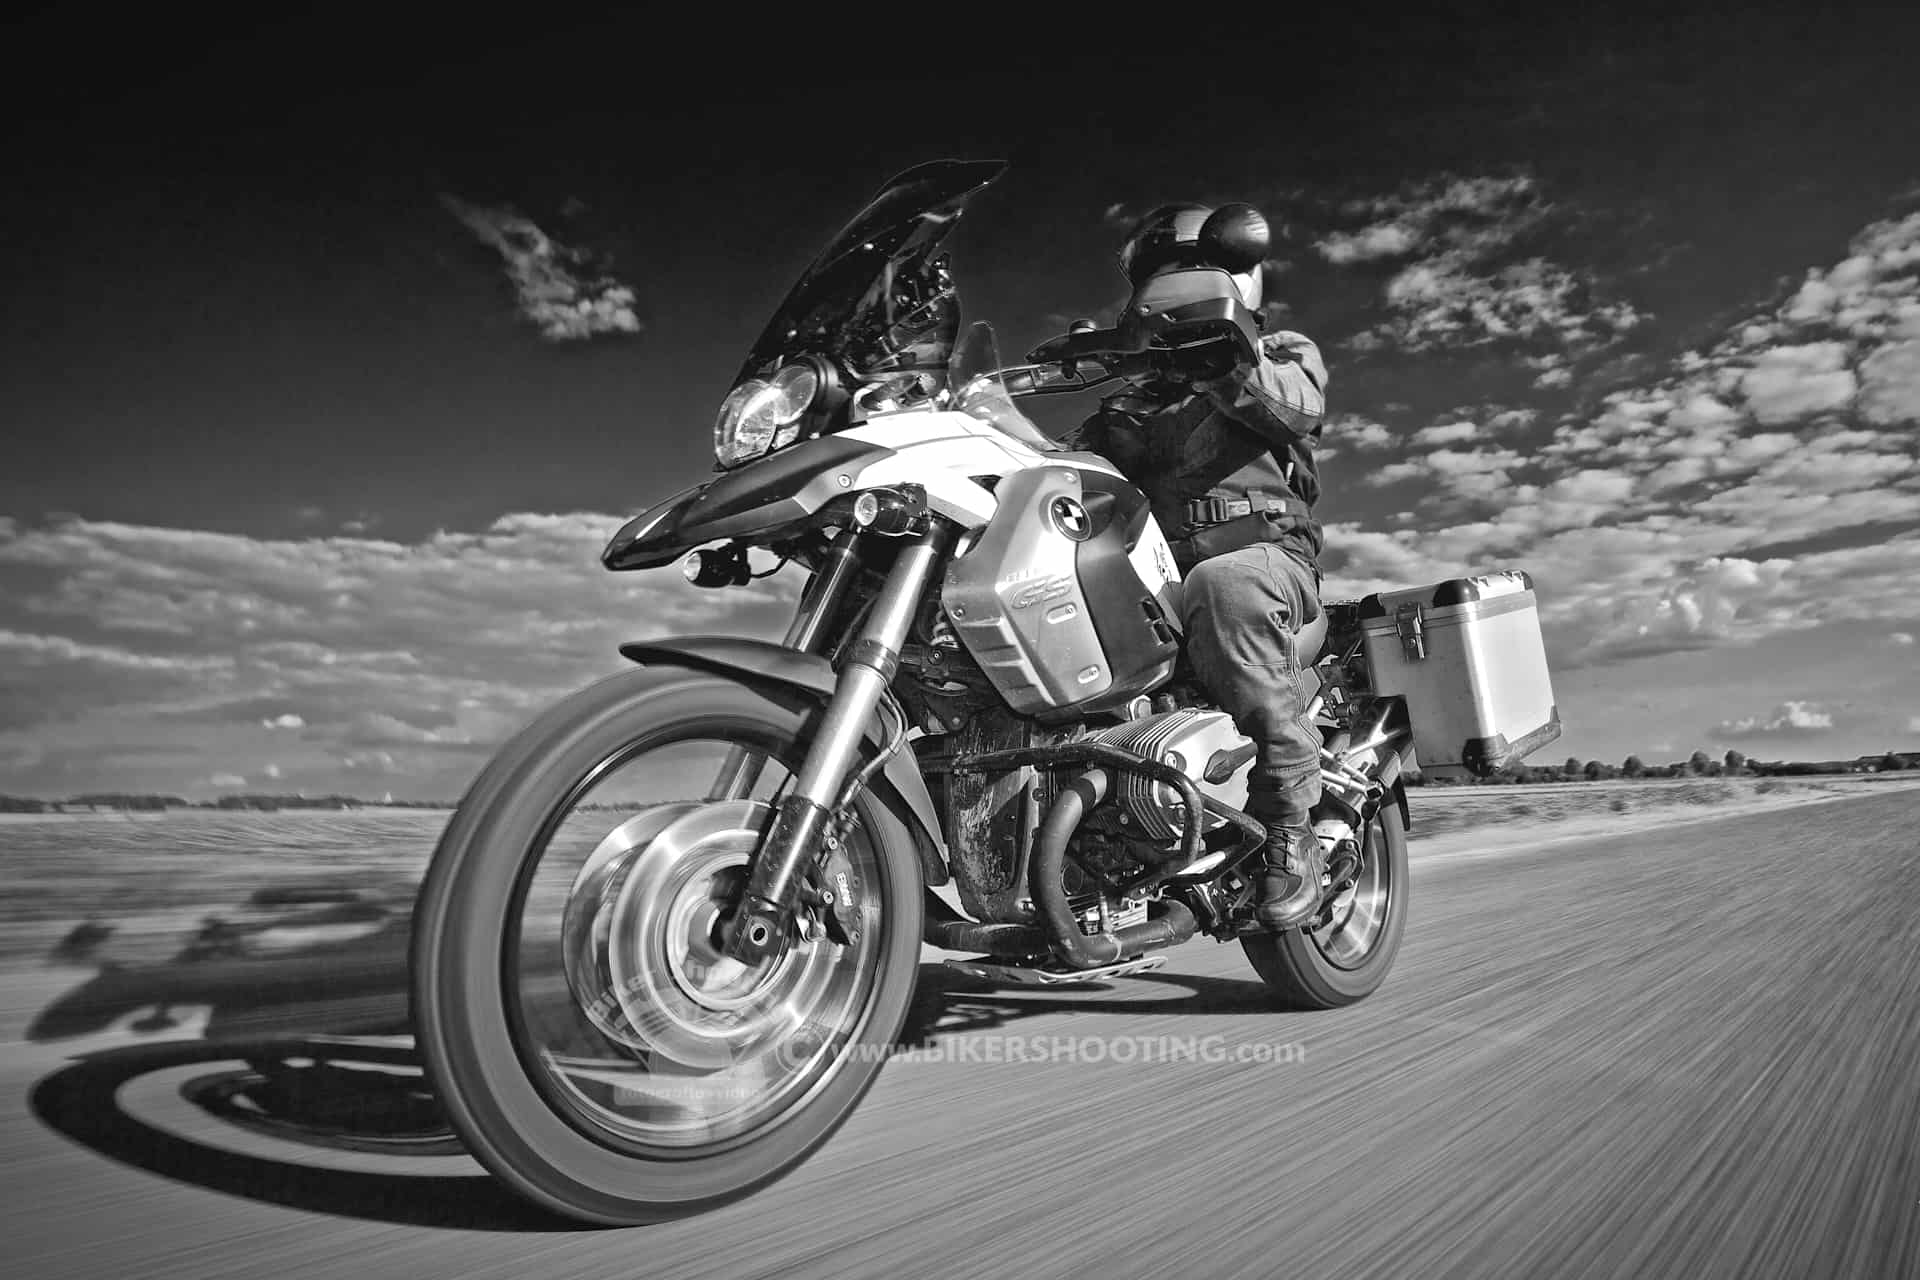 Biker Fotoshooting SPEED Fotoshooting motorrad shooting, biker fotoshooting, fotoshooting mit motorrad, fotoshooting motorrad, motorrad fotoshooting